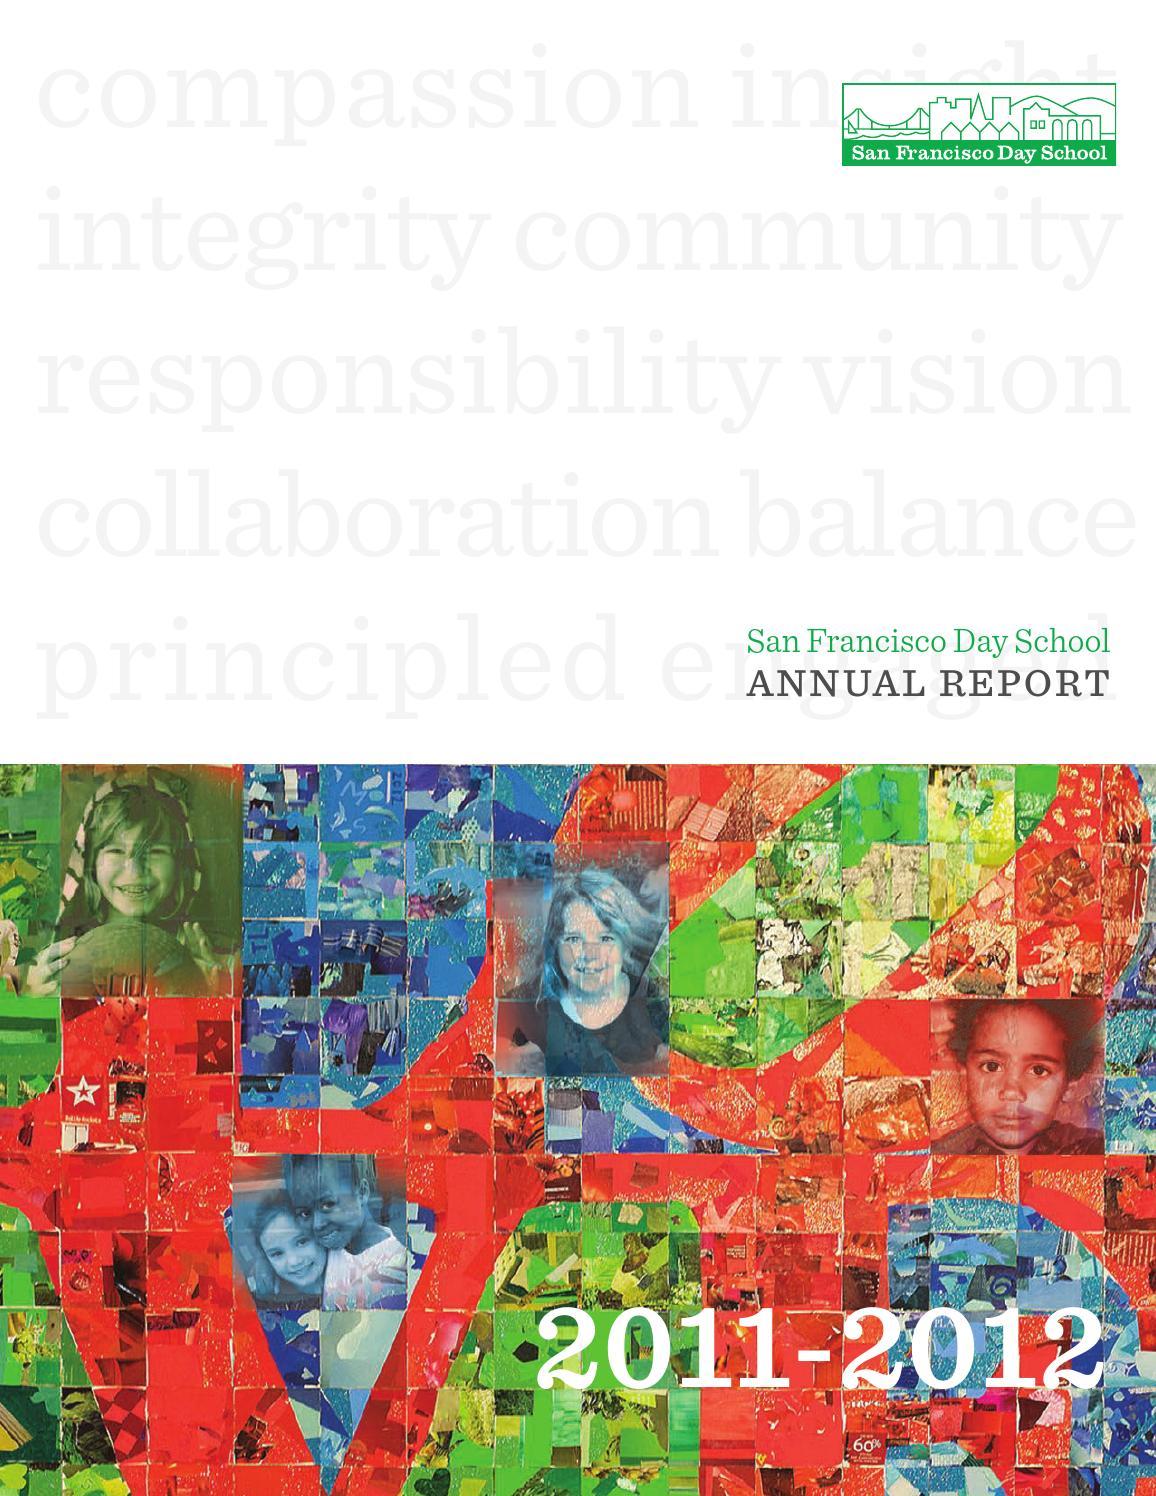 Annualreport2011 12 finallr by San Francisco Day School - issuu